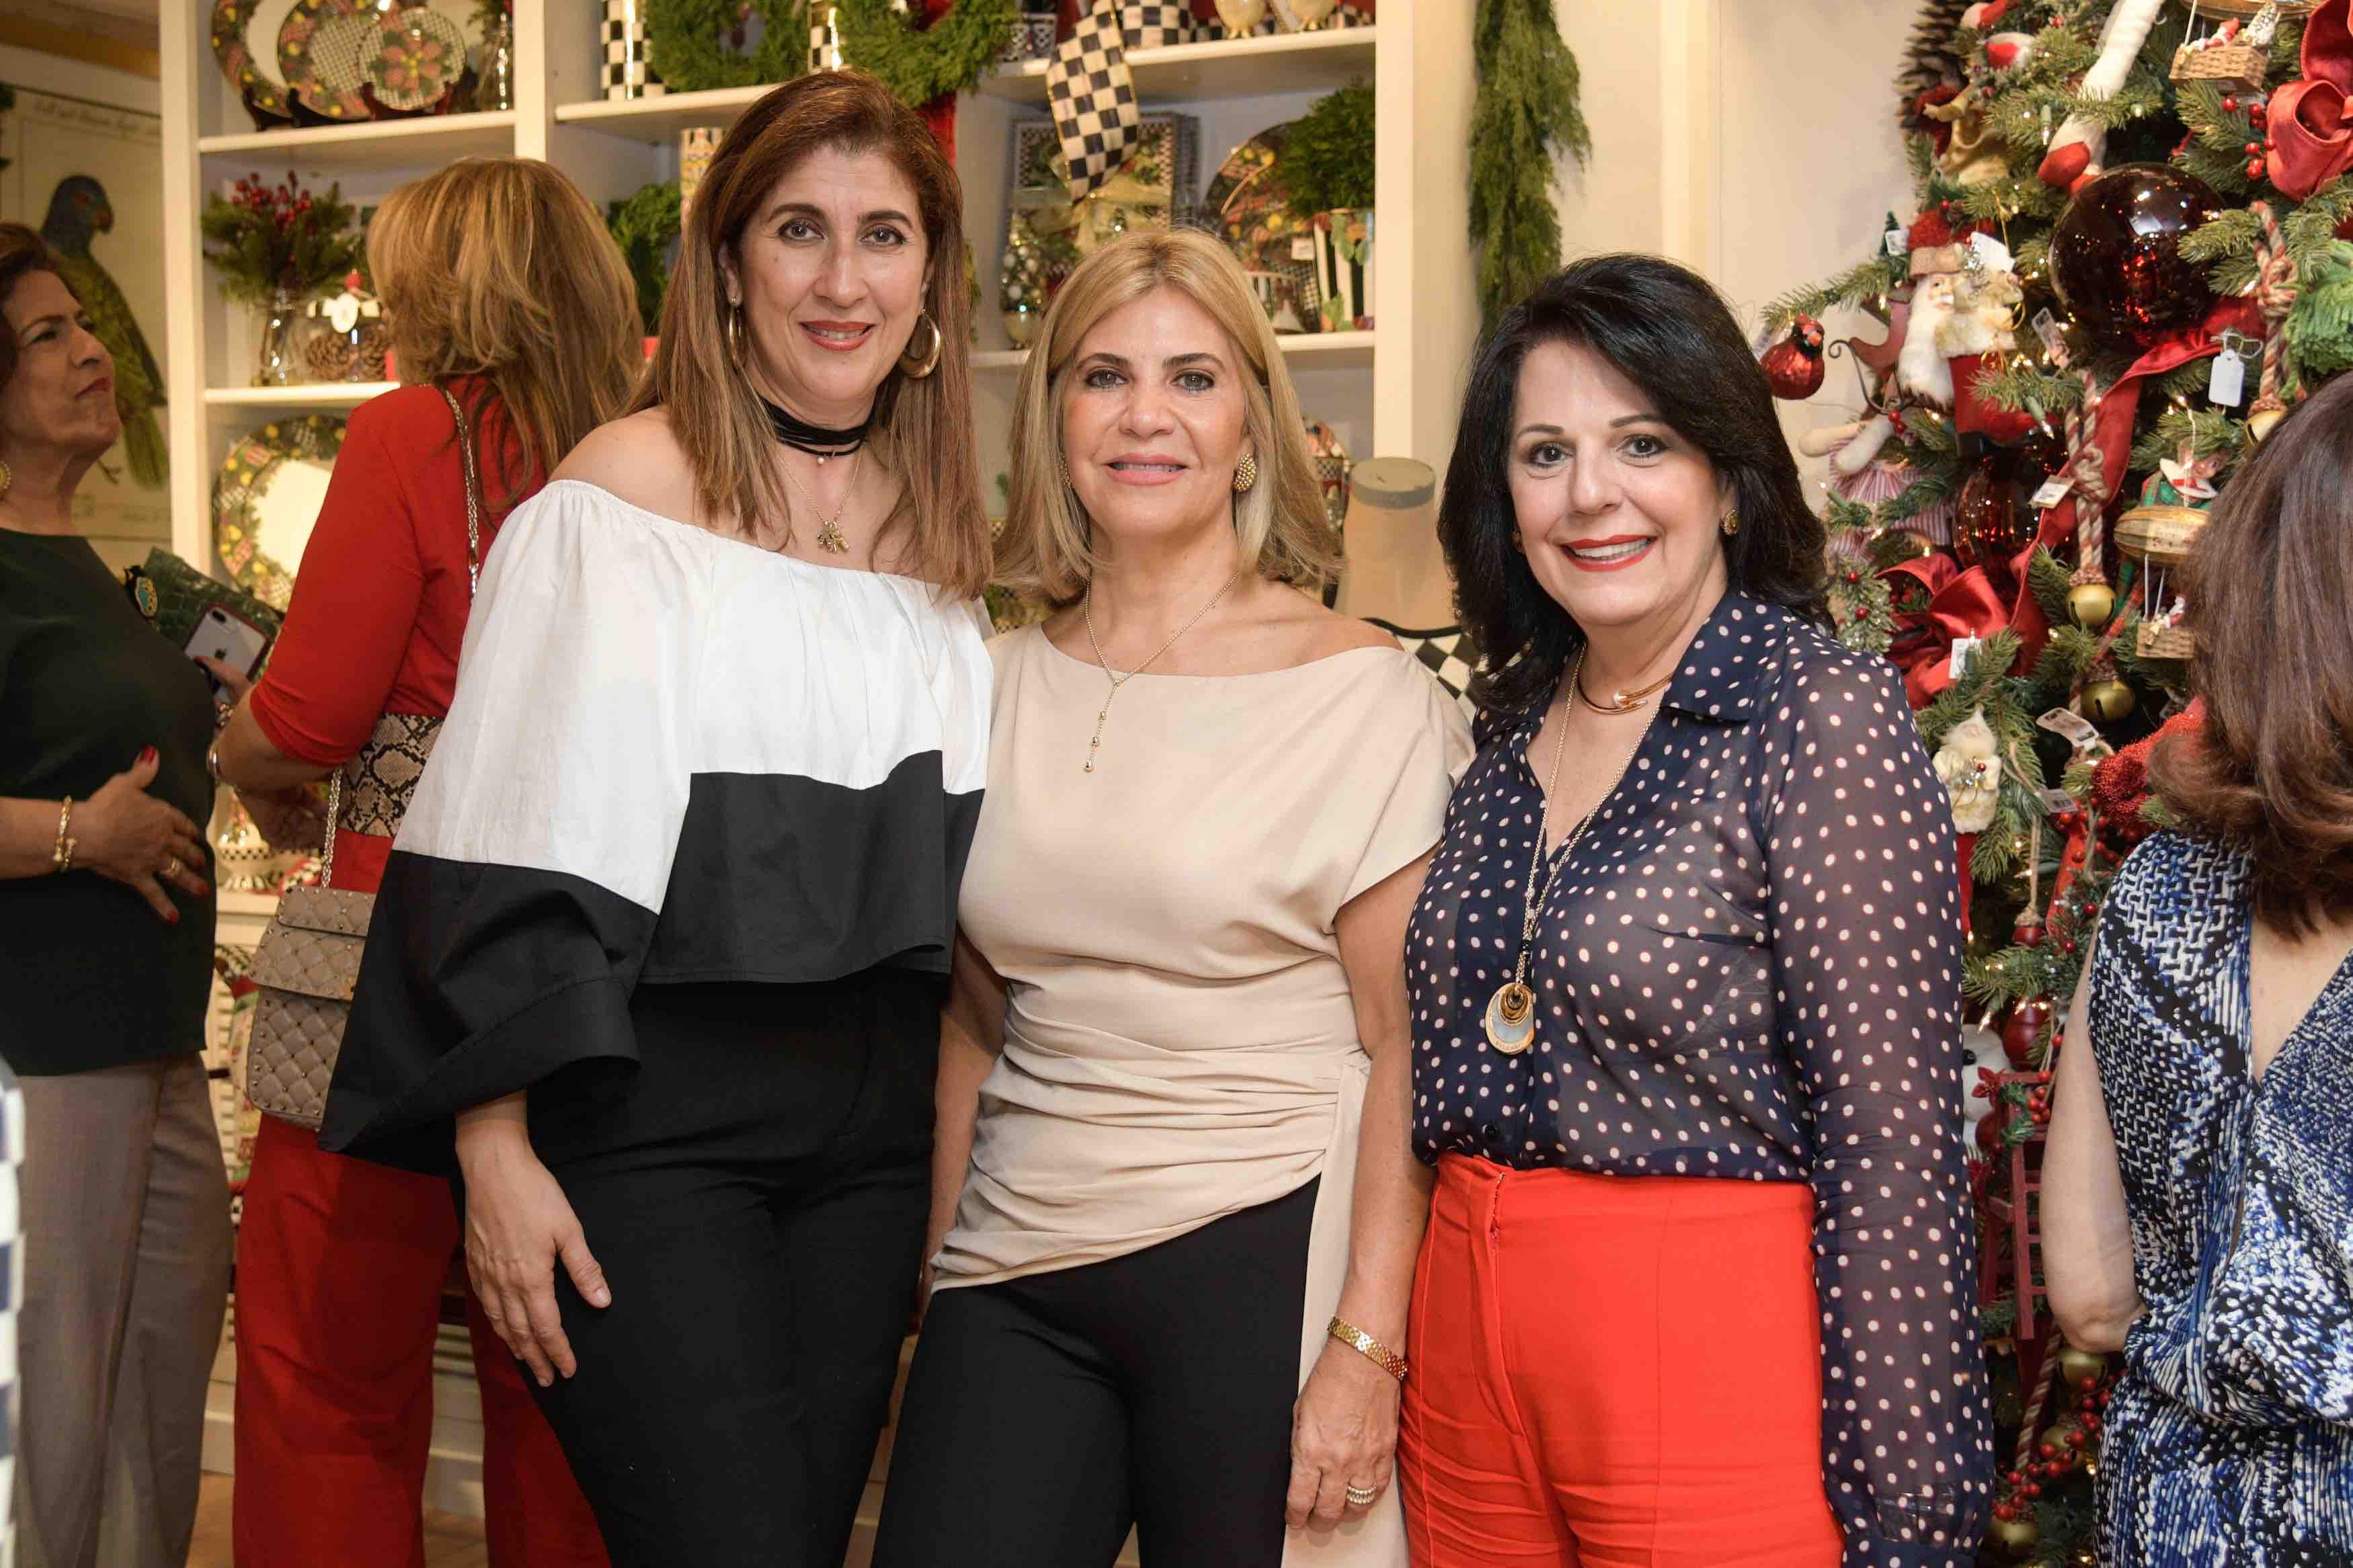 2. Desiree Bonetti, Mayra Pellerano & Chabela Estrella De Bisono